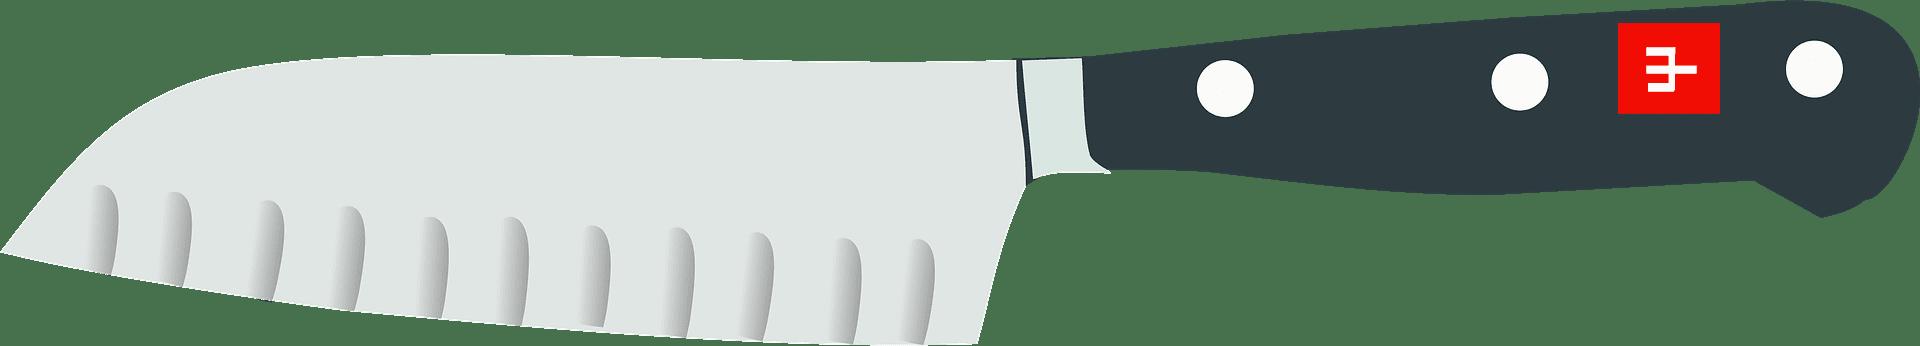 Knife clipart transparent background 9